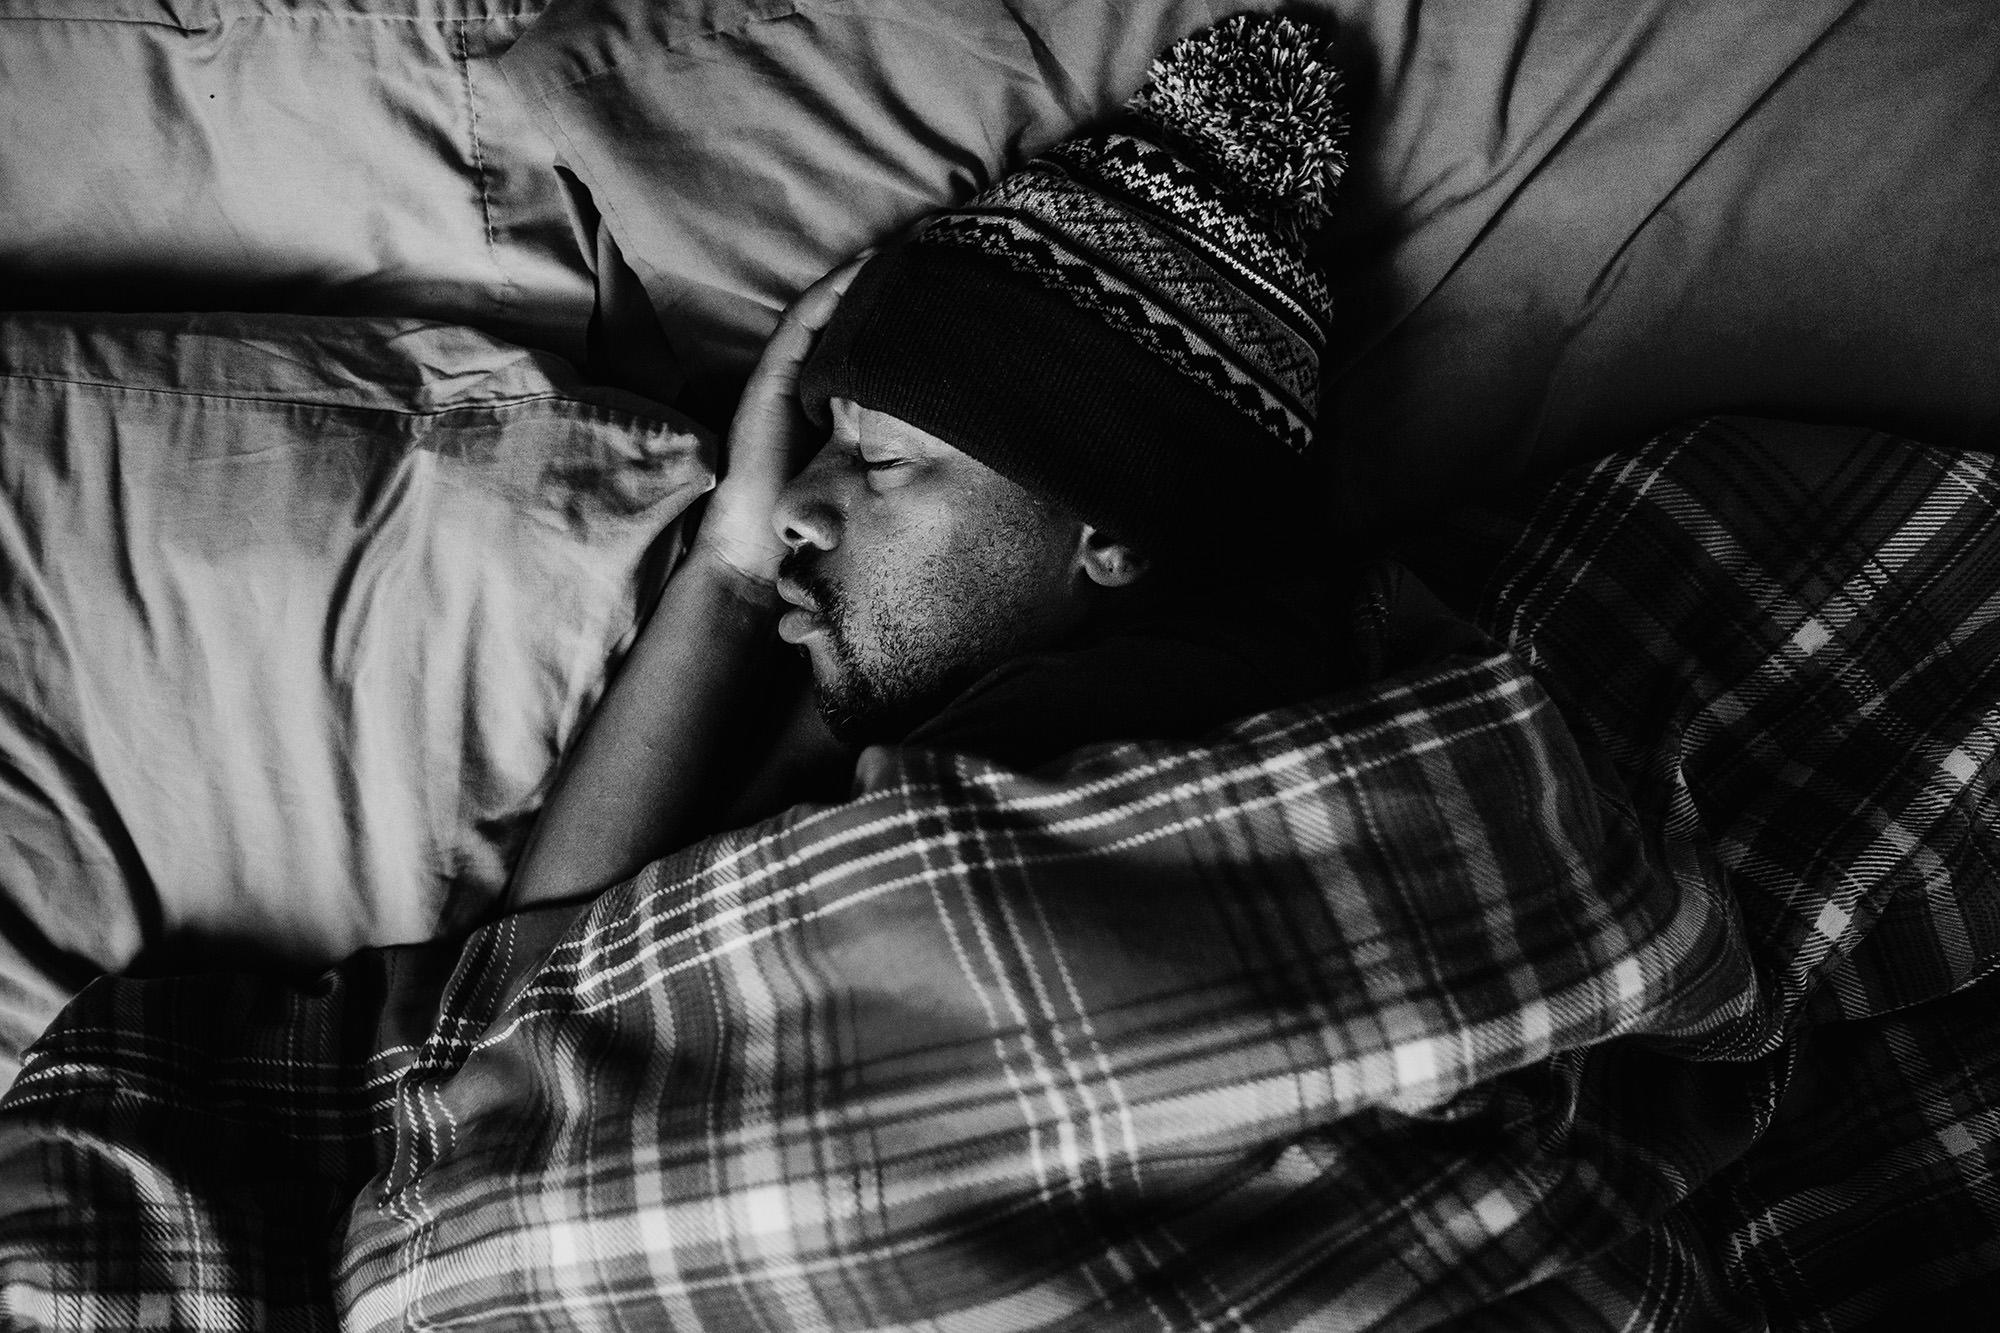 man in bed sleeping